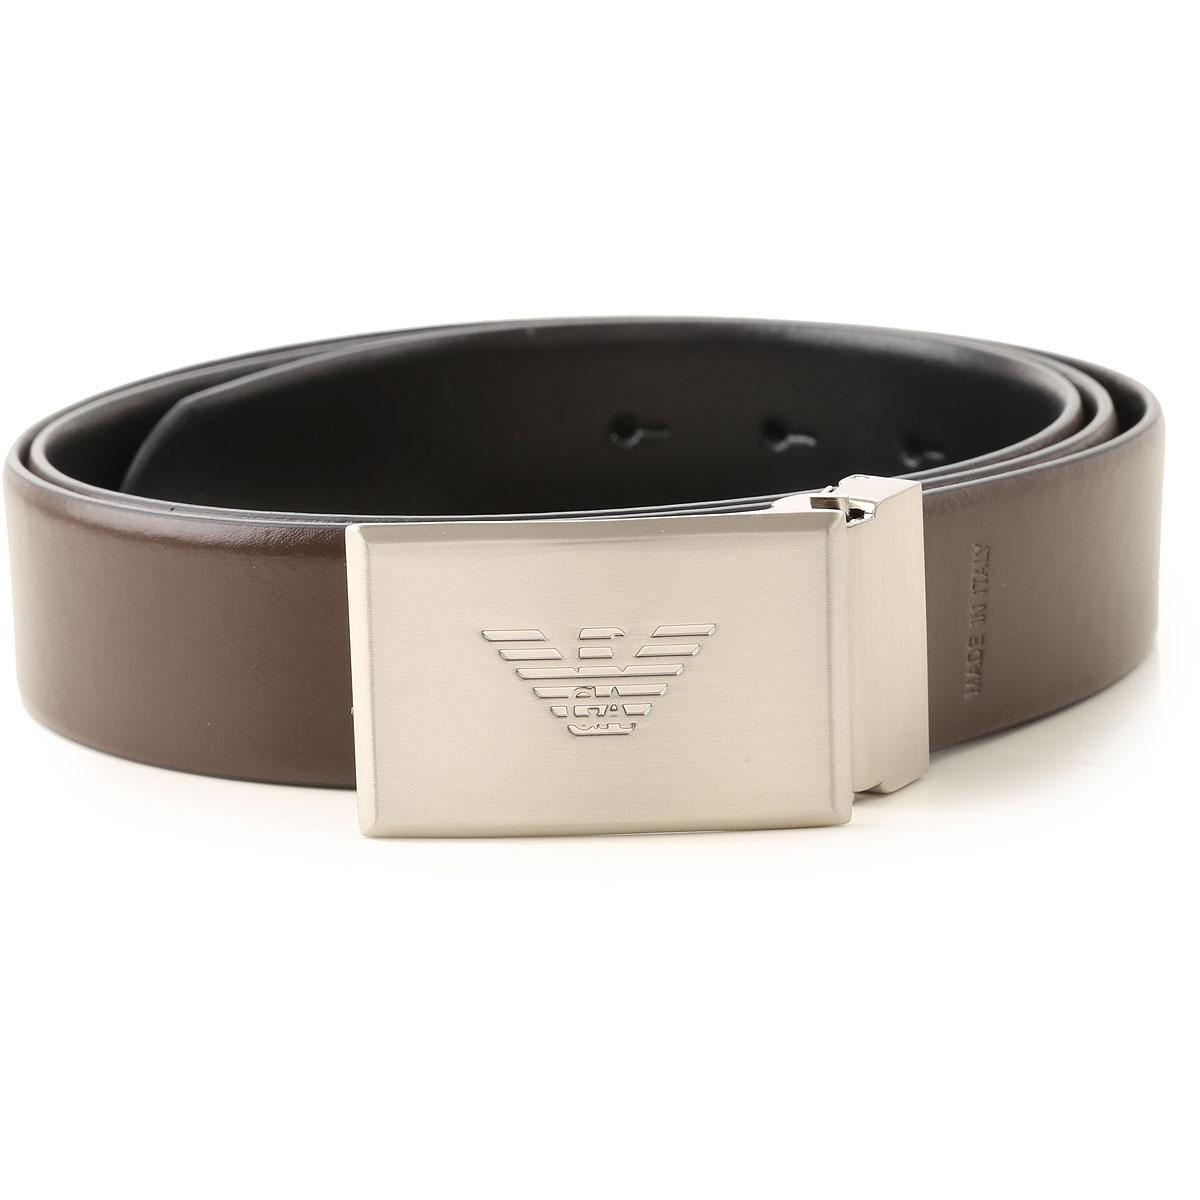 Emporio Armani Belts On Sale, Black, Leather, 2019